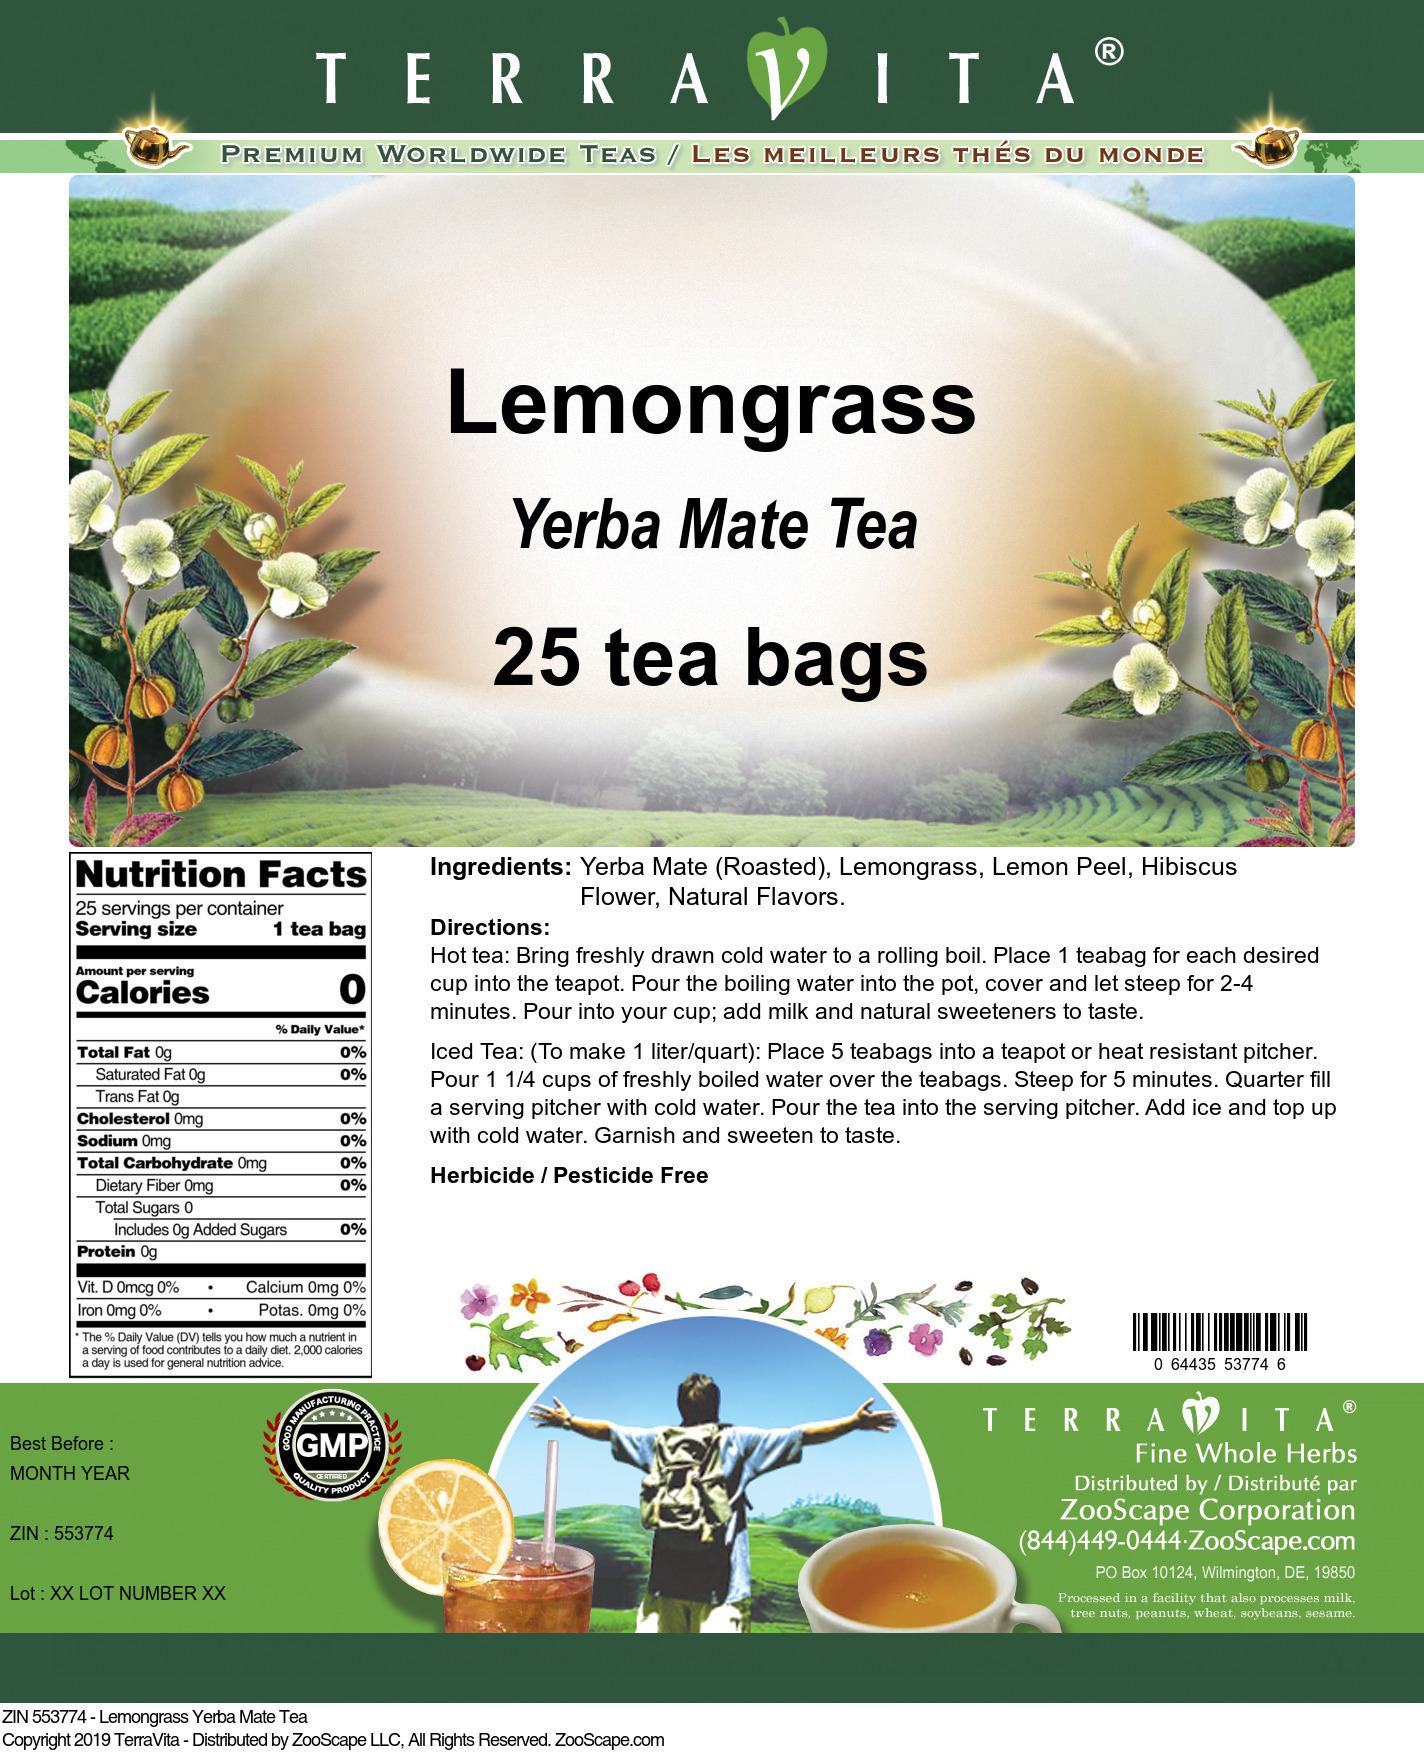 Lemongrass Yerba Mate Tea